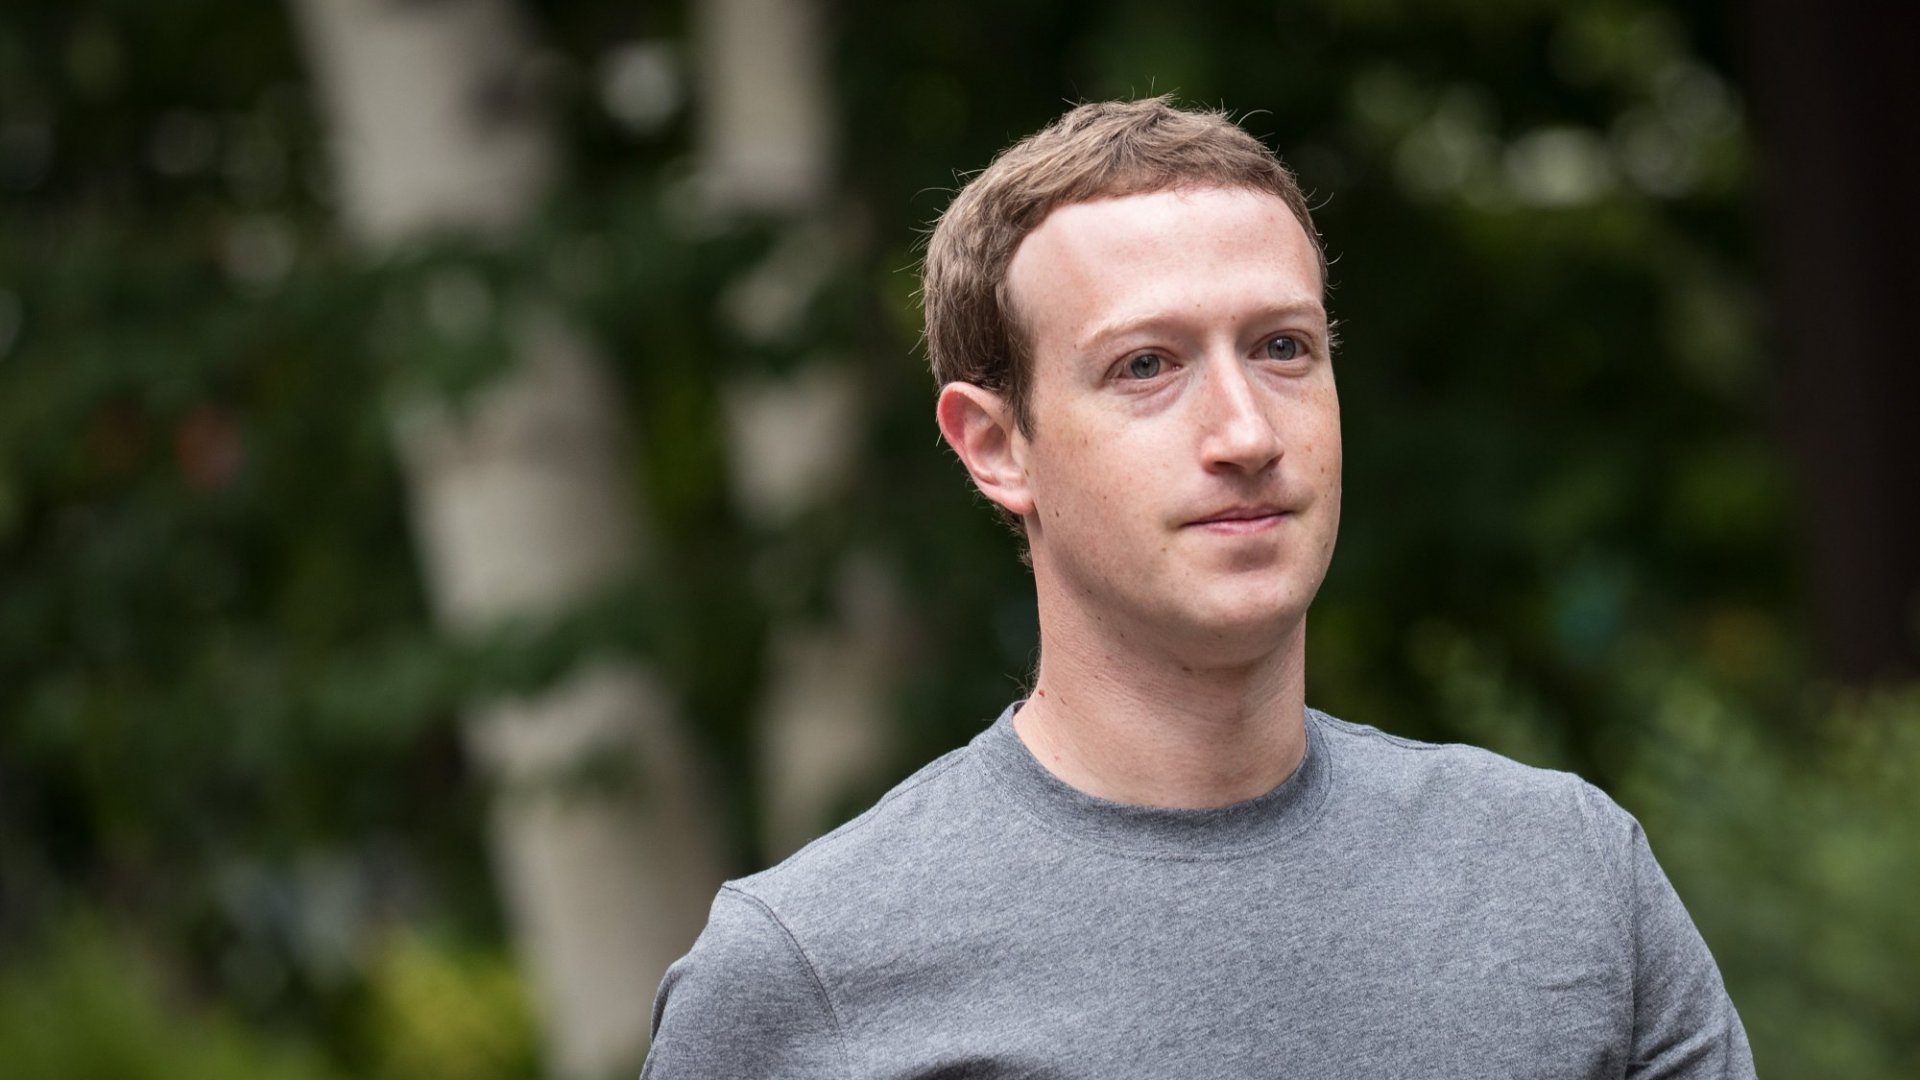 1 Thing Mark Zuckerberg Needs to Do to 'Fix' Facebook